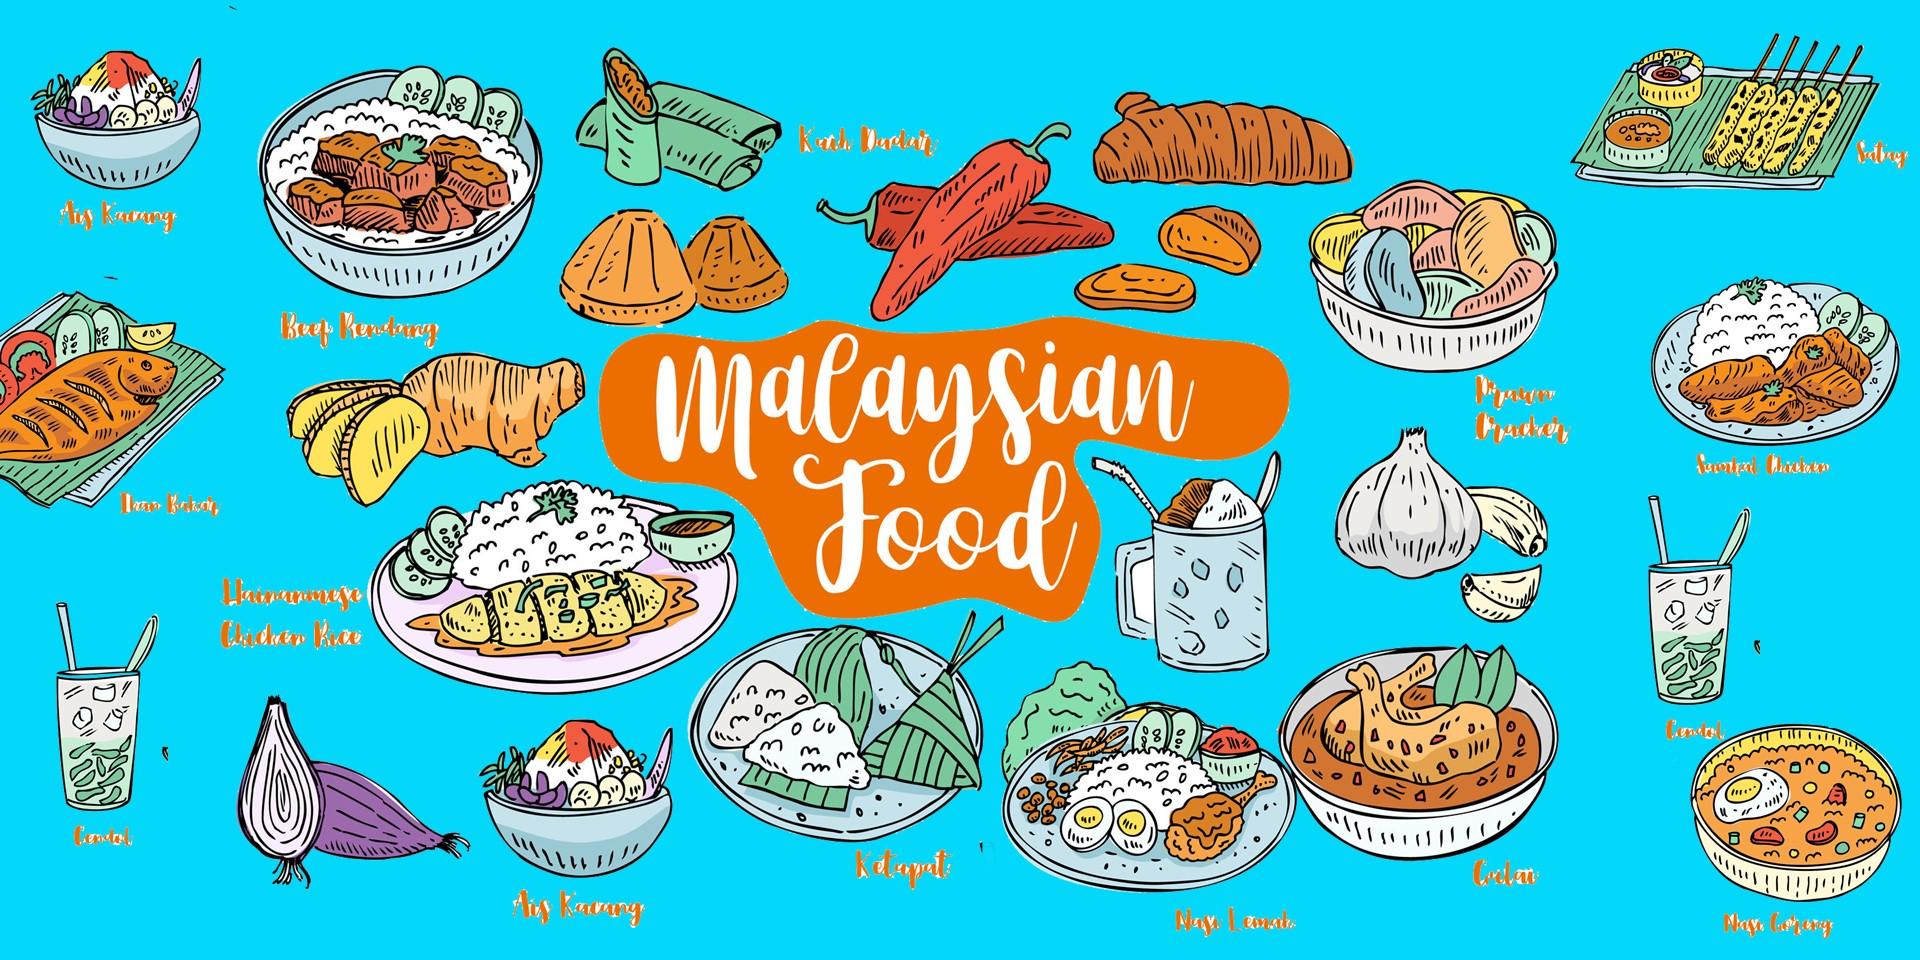 illustration of a variety of Malaysian food such as nasi lemak, nasi goreng, satay, ikan bakar, chicken rice.